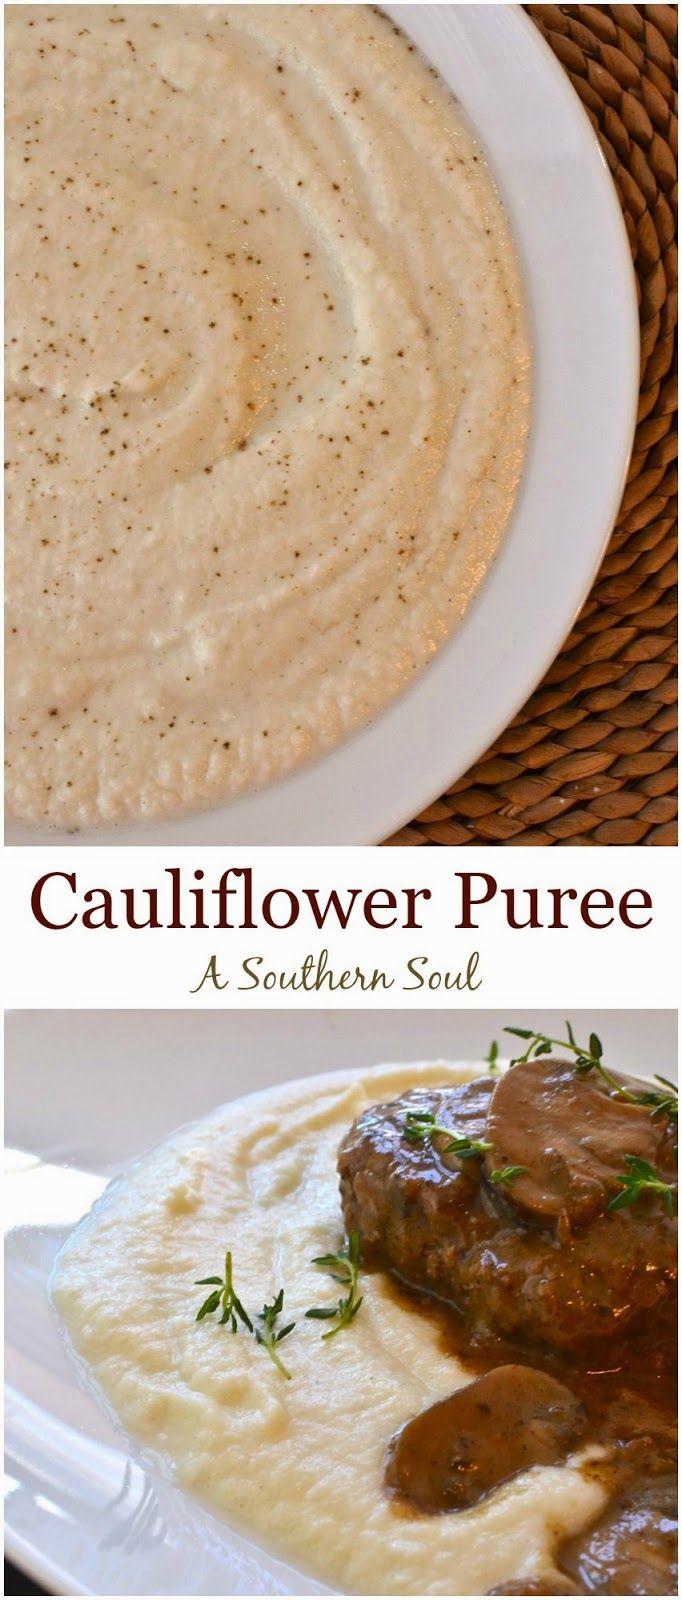 Cauliflower Puree Recipe is creamy, rich & a surprise dish for even ...